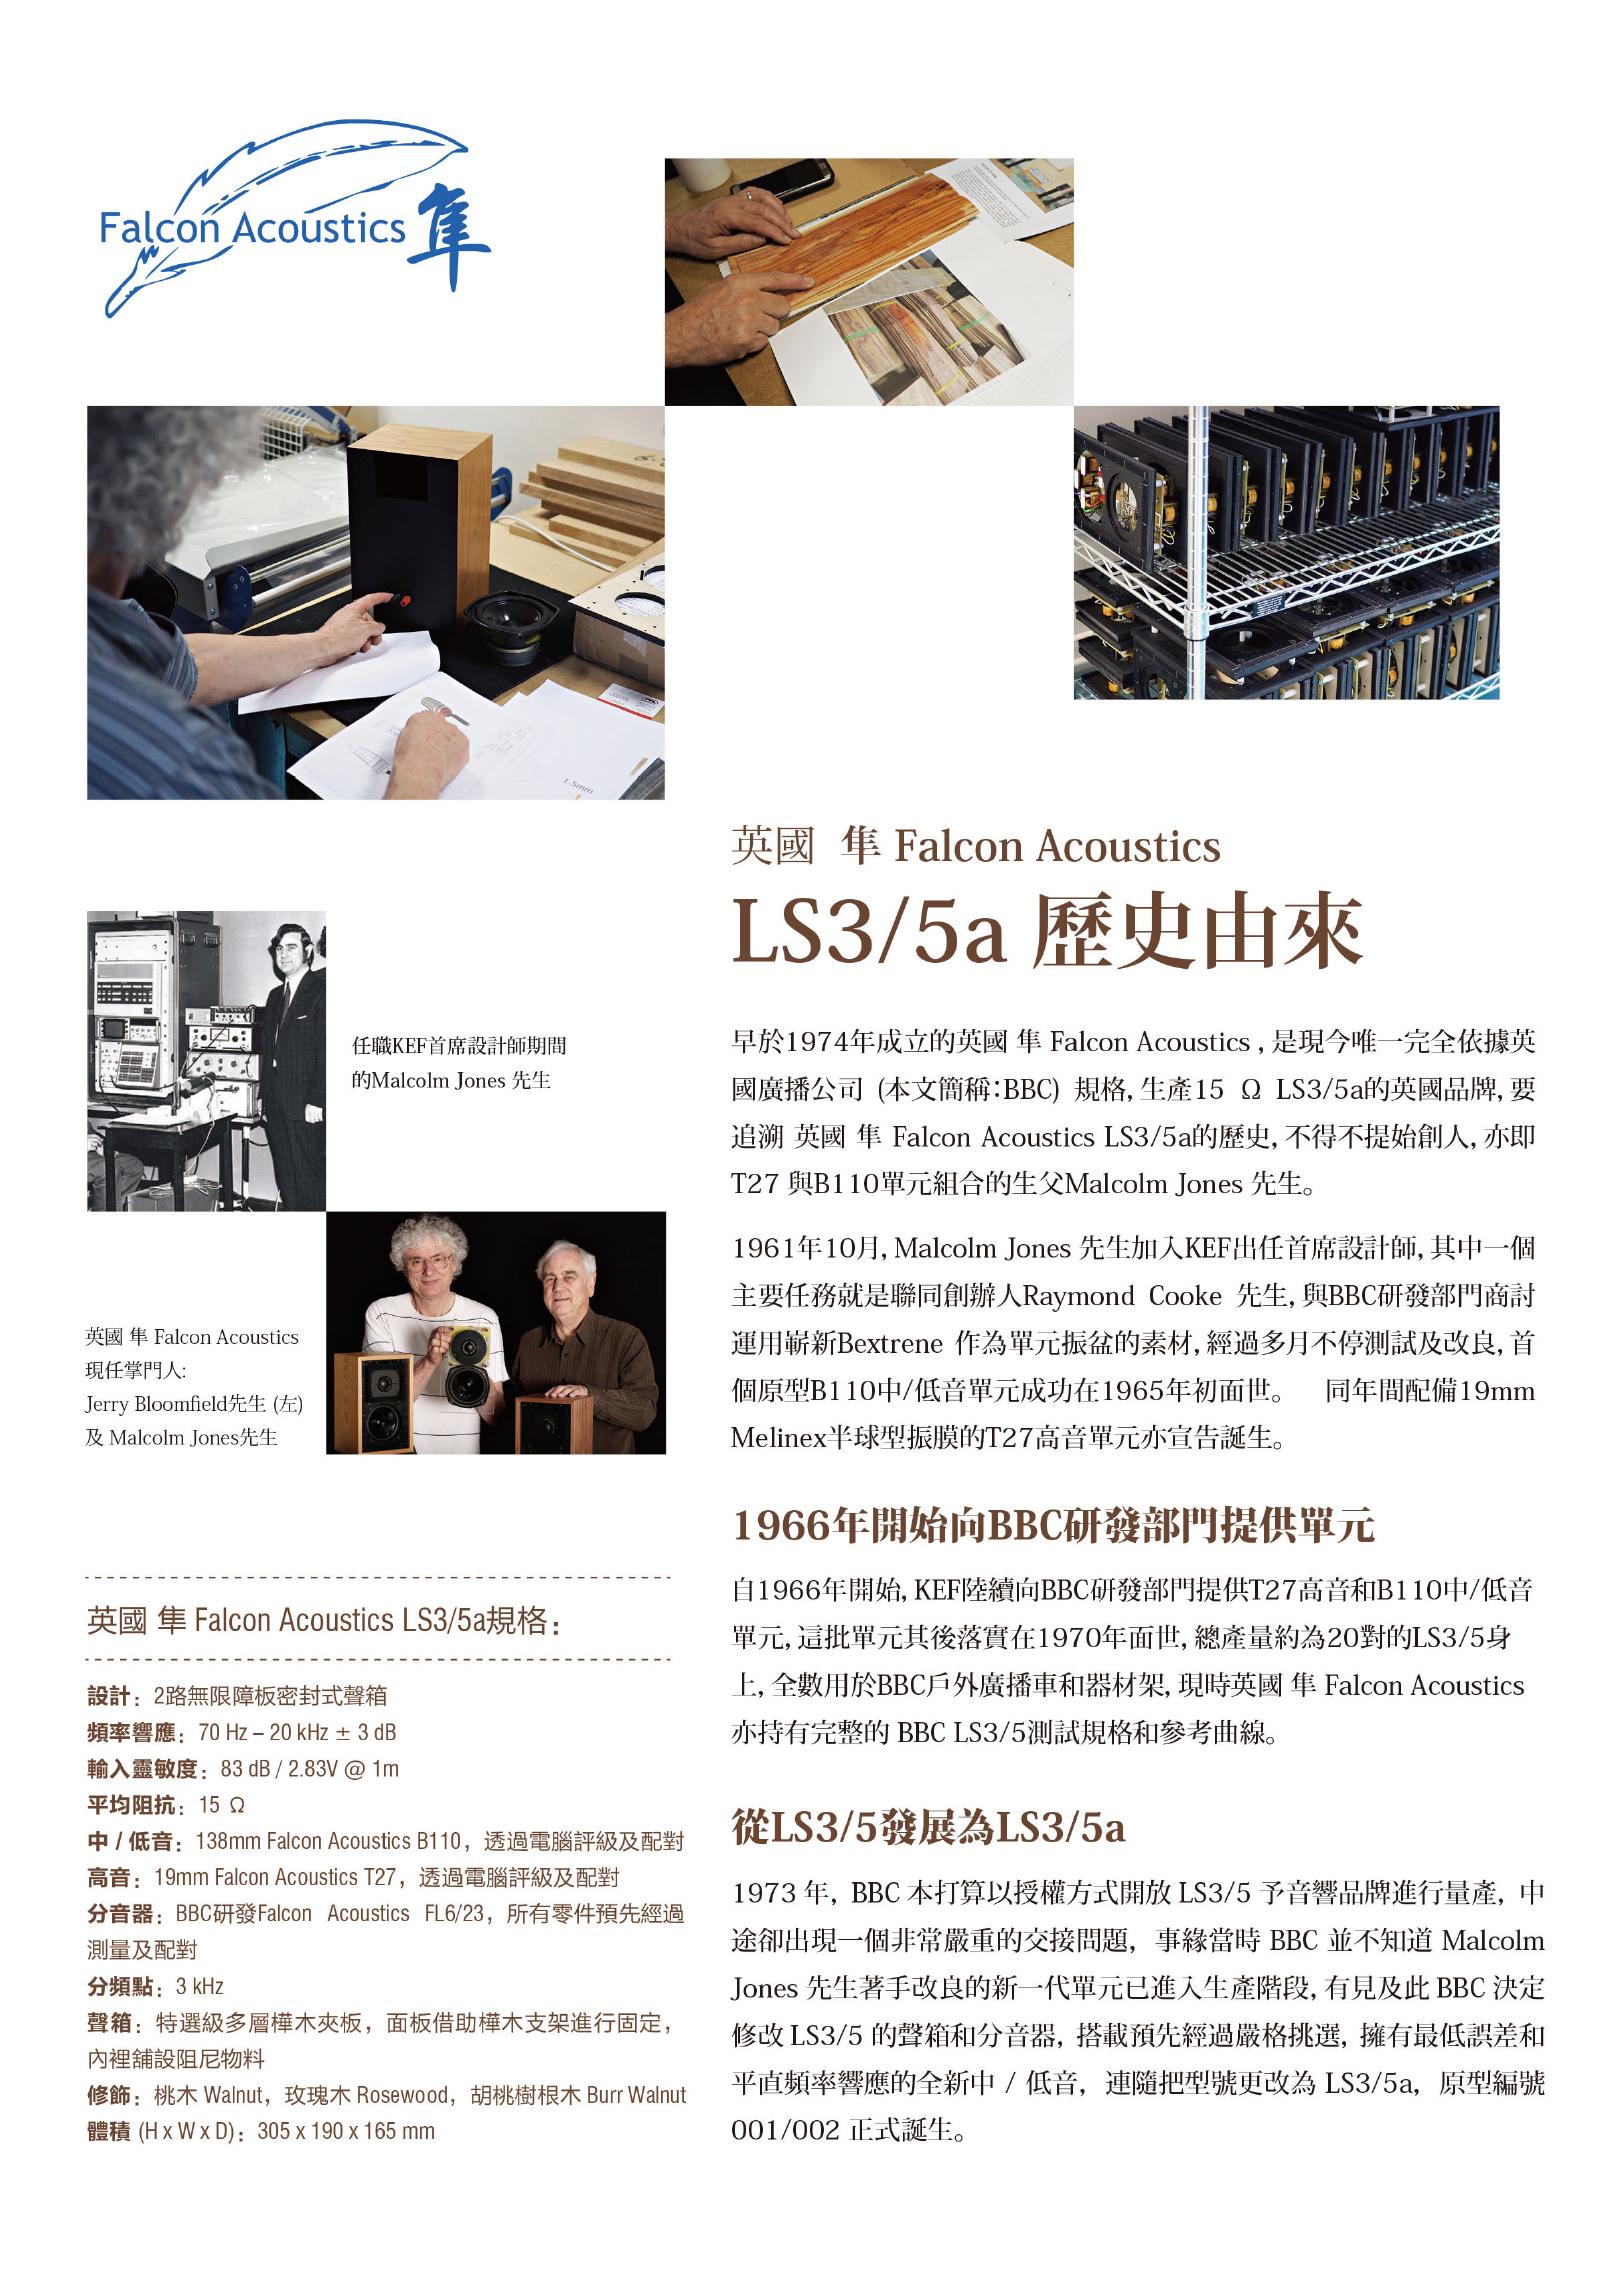 Falcon Acoustics_201803_05a-2 copy